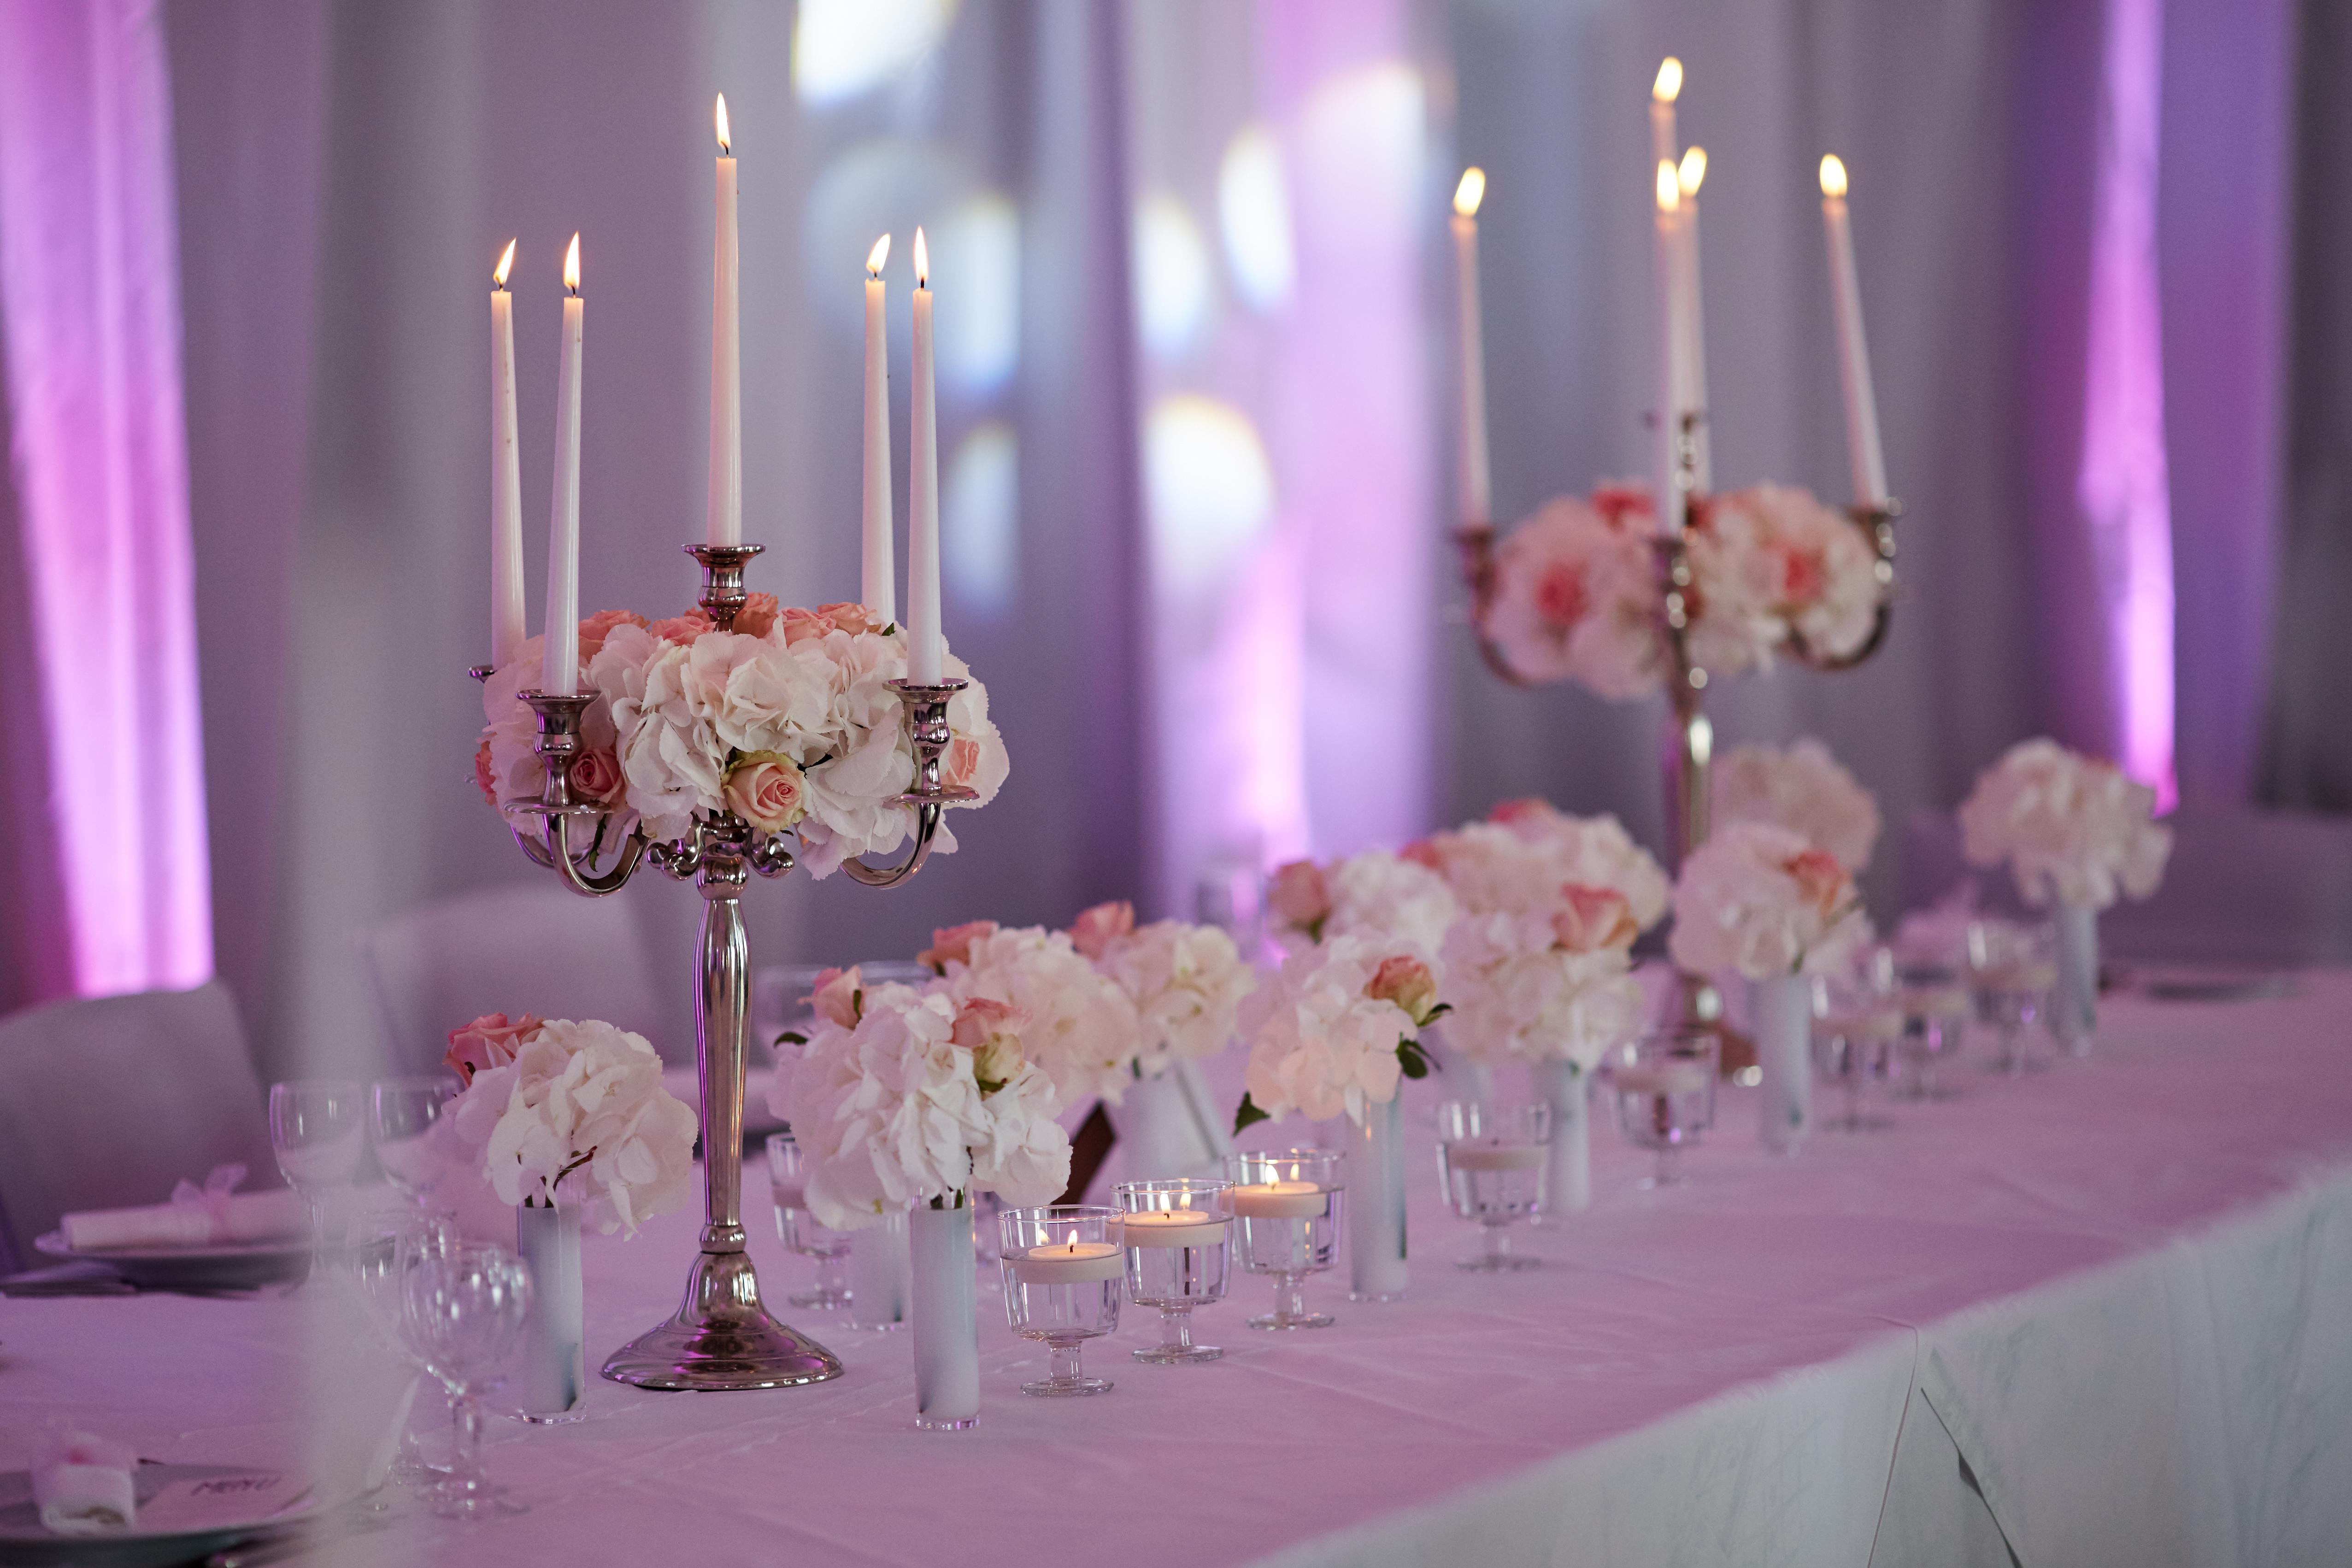 mariage rose par christine raiga organisatrice de mariage